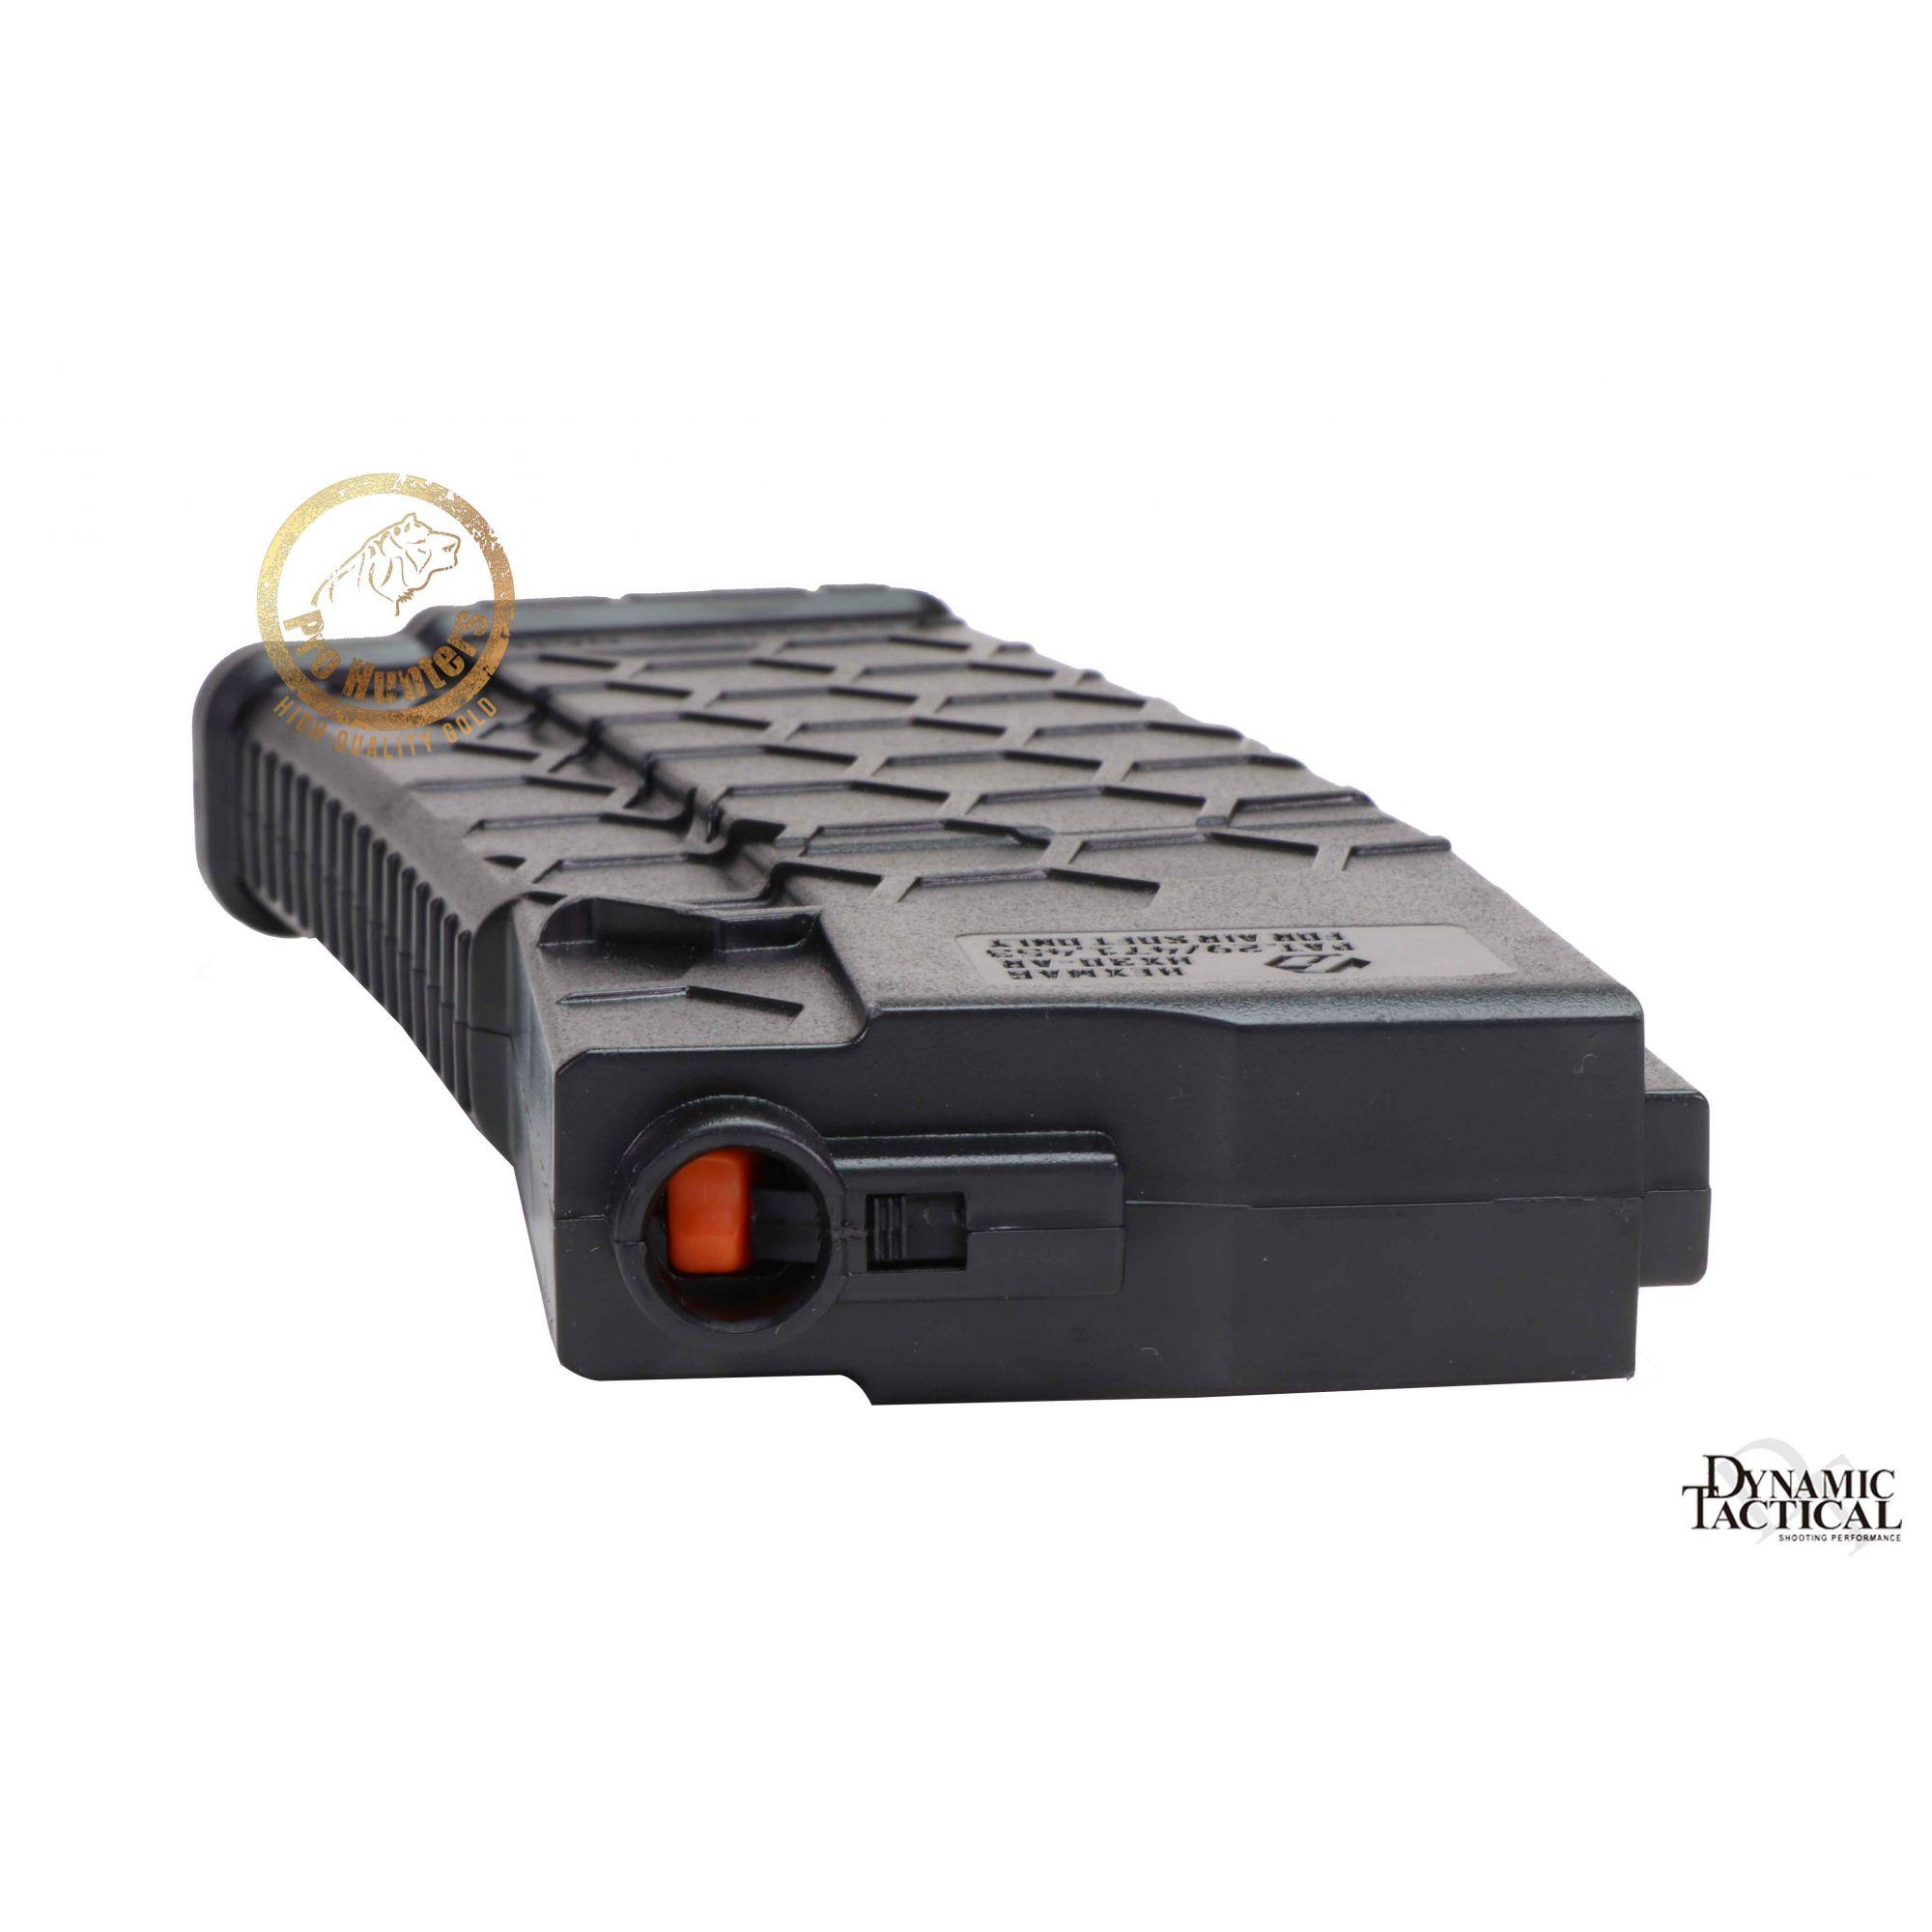 Rifle Airsoft Dytac LA M4 Carbine - Dark Earth